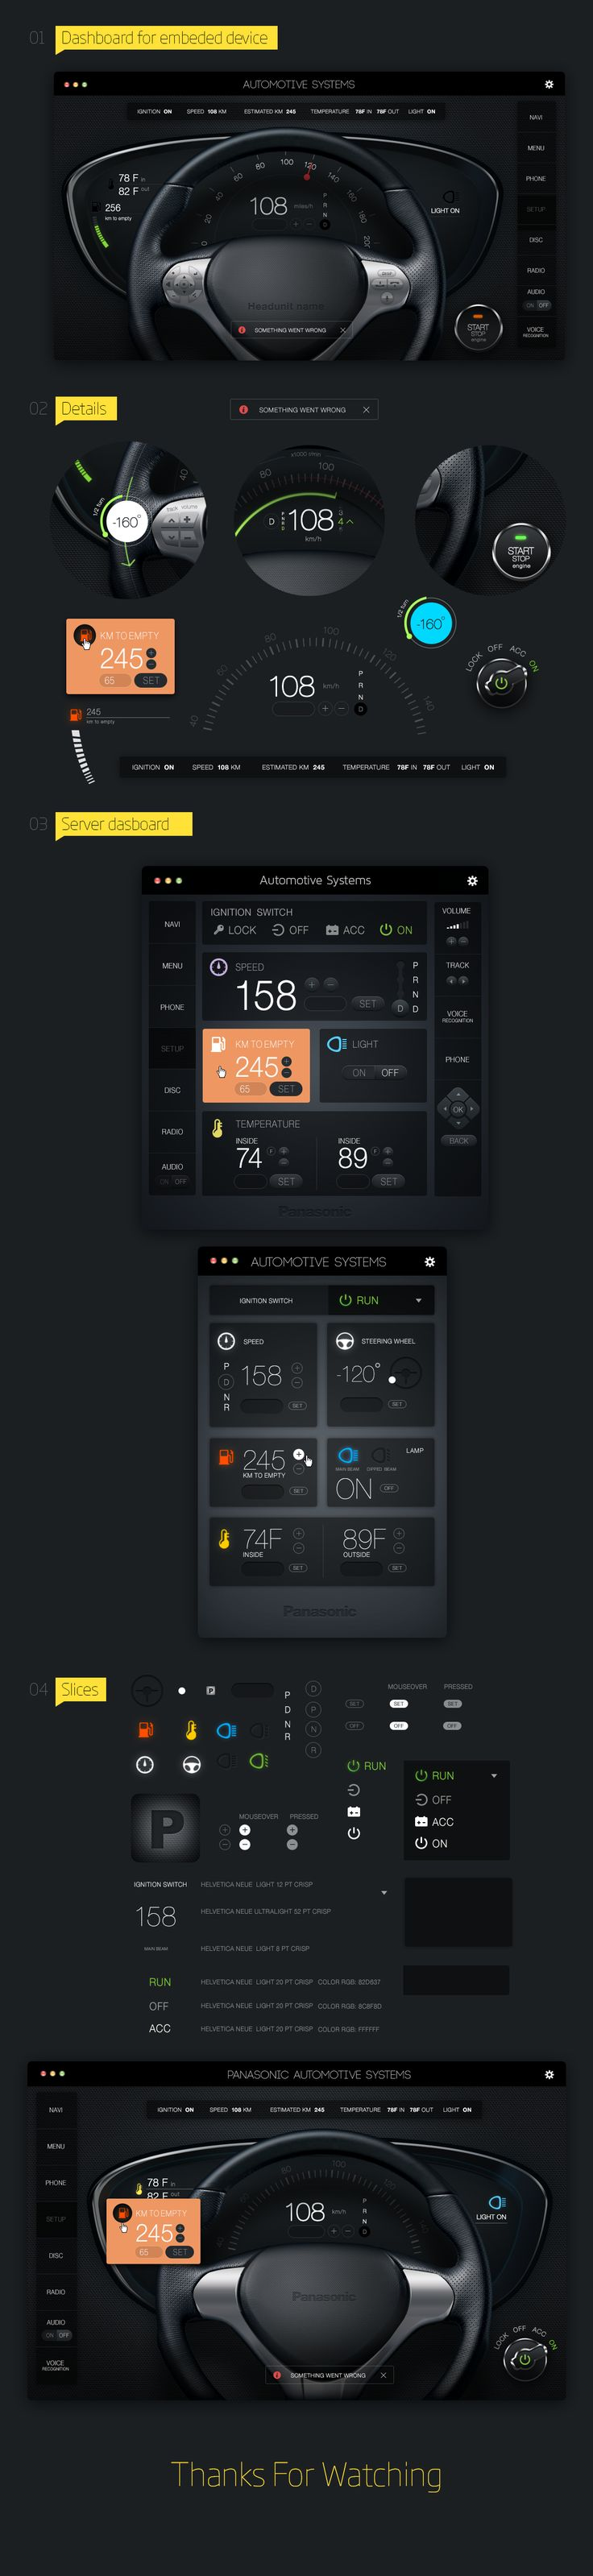 Panasonic Head Unit Controller, Interface © Николай Апостол #car #vehicle #ui